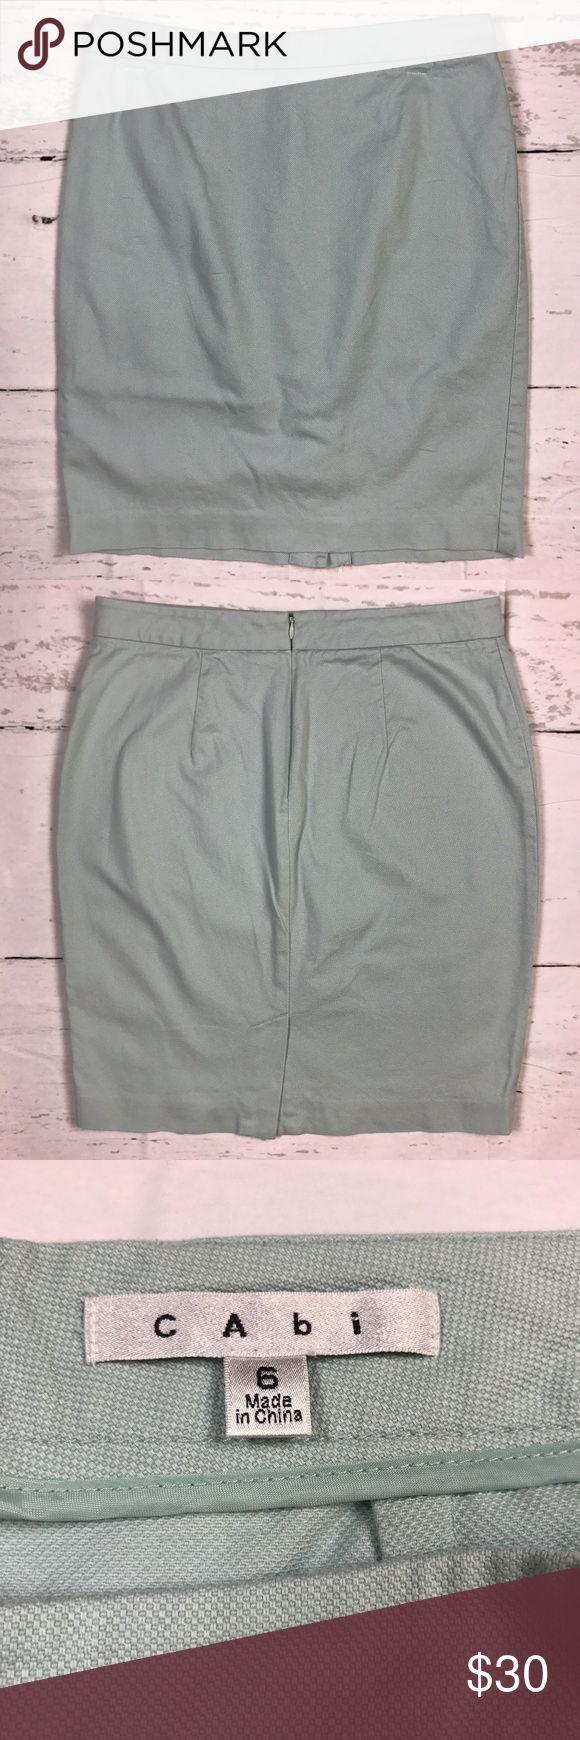 "CAbi Skirt Jordan Almond Pale Mint Green Pencil 6 Brand: CAbi Color: Almond Pale Mint Green Size: 6 on the tag label Material: Cotton Blend  Measurements Waist: 16"" x2 = 32"" Length: 21 1/4"" CAbi Skirts Pencil"